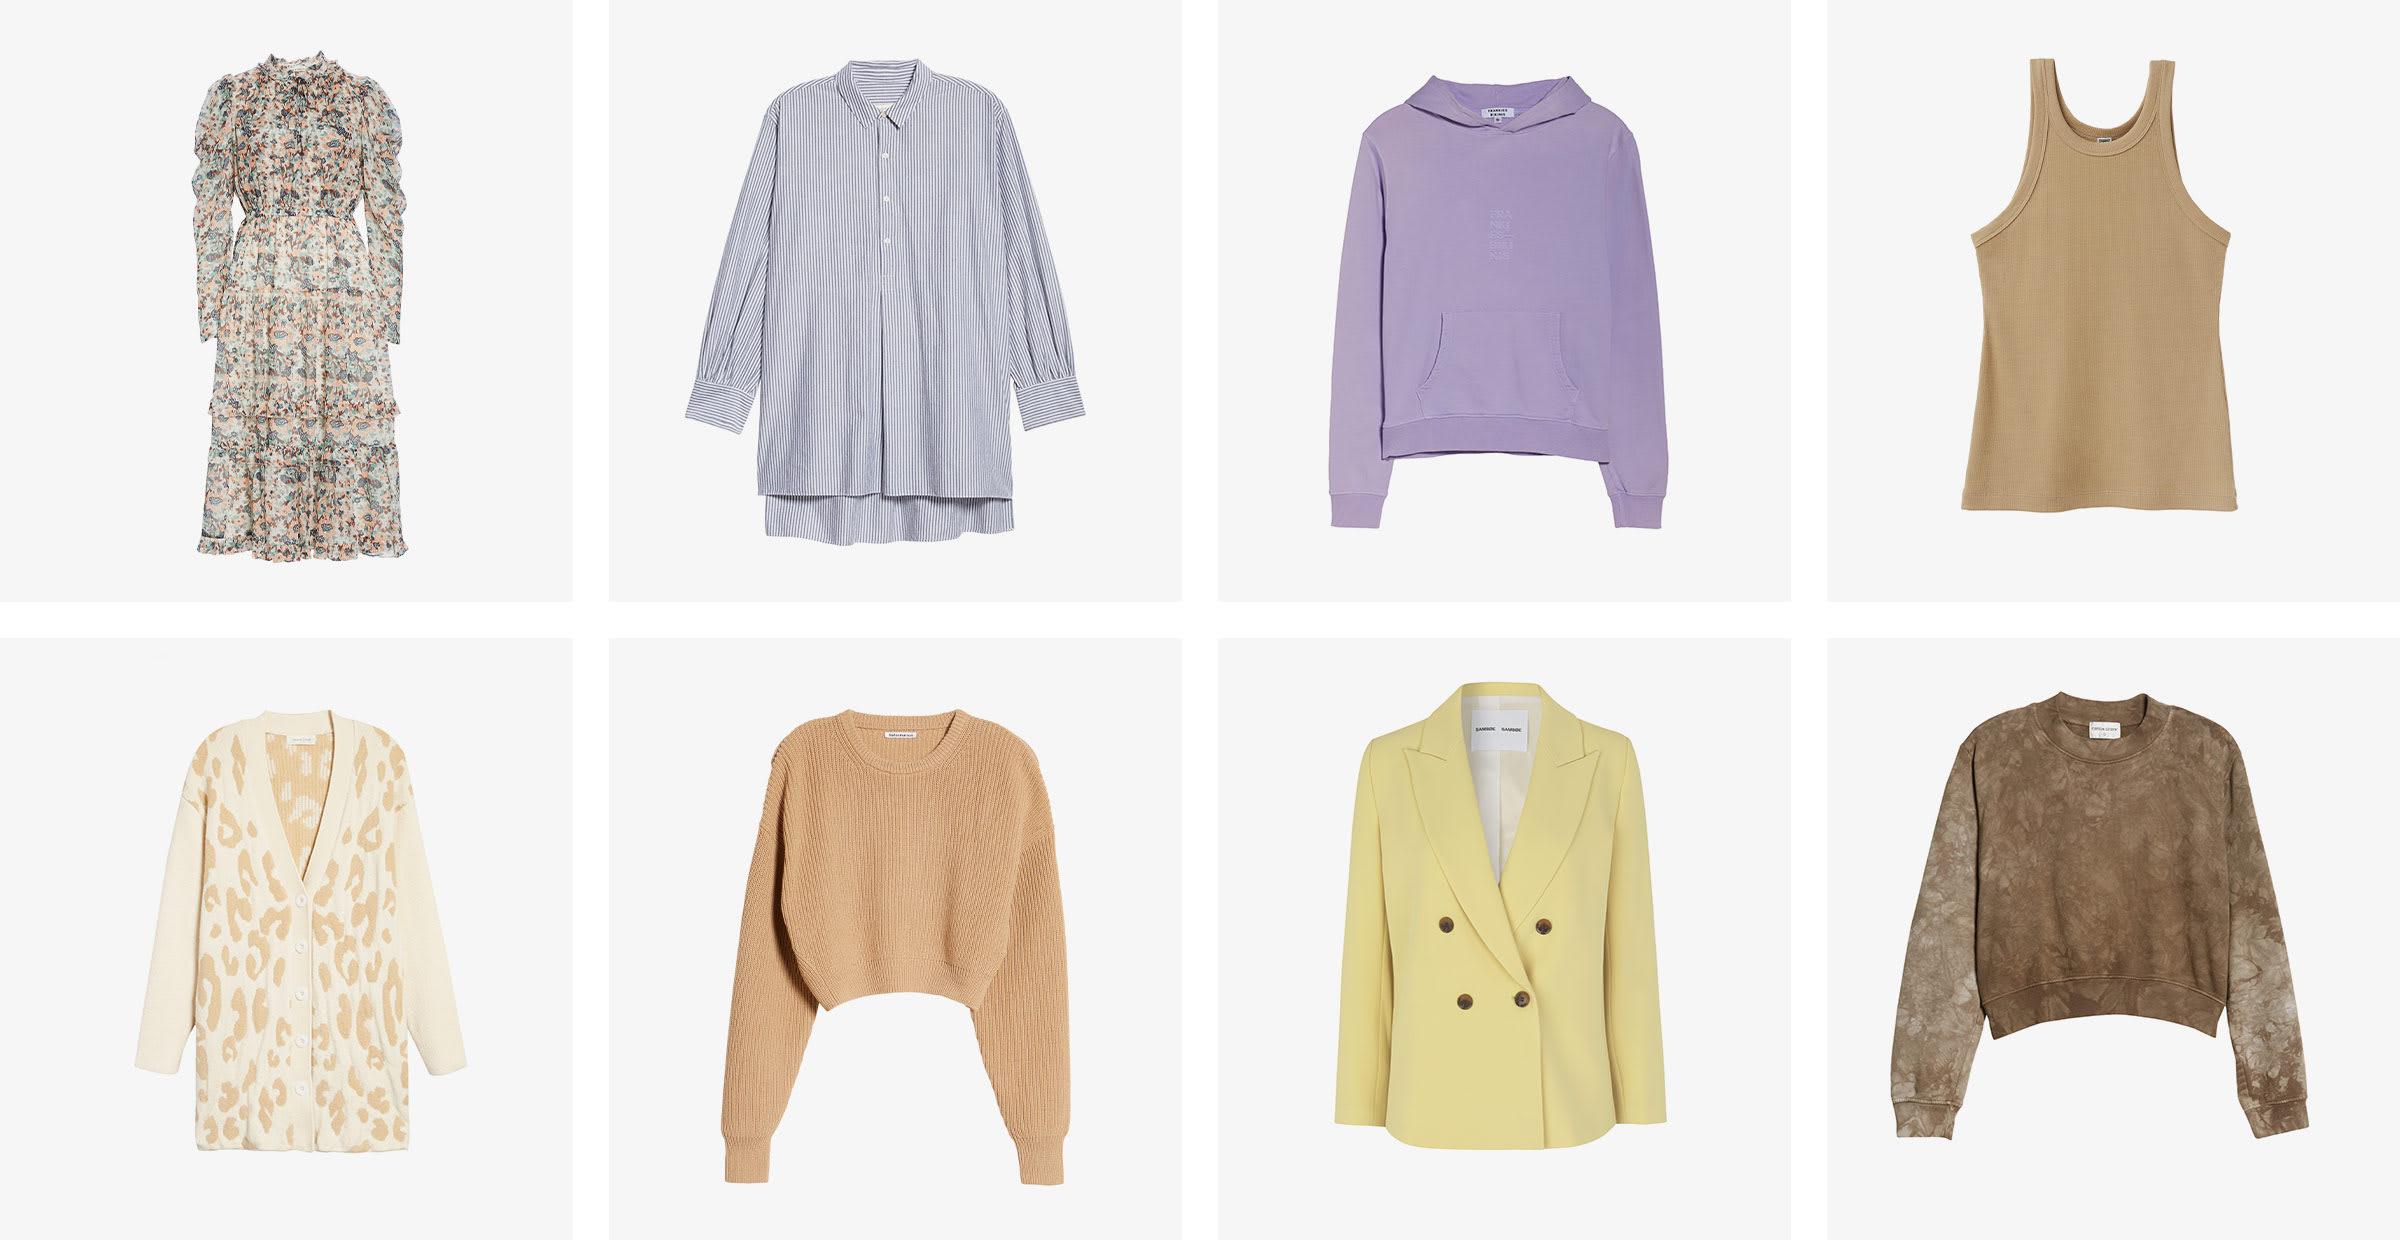 Women's printed dress, blue shirt, purple hoodie, tan tank, printed cardigan, tan sweater, yellow blazer and tie-die sweater.